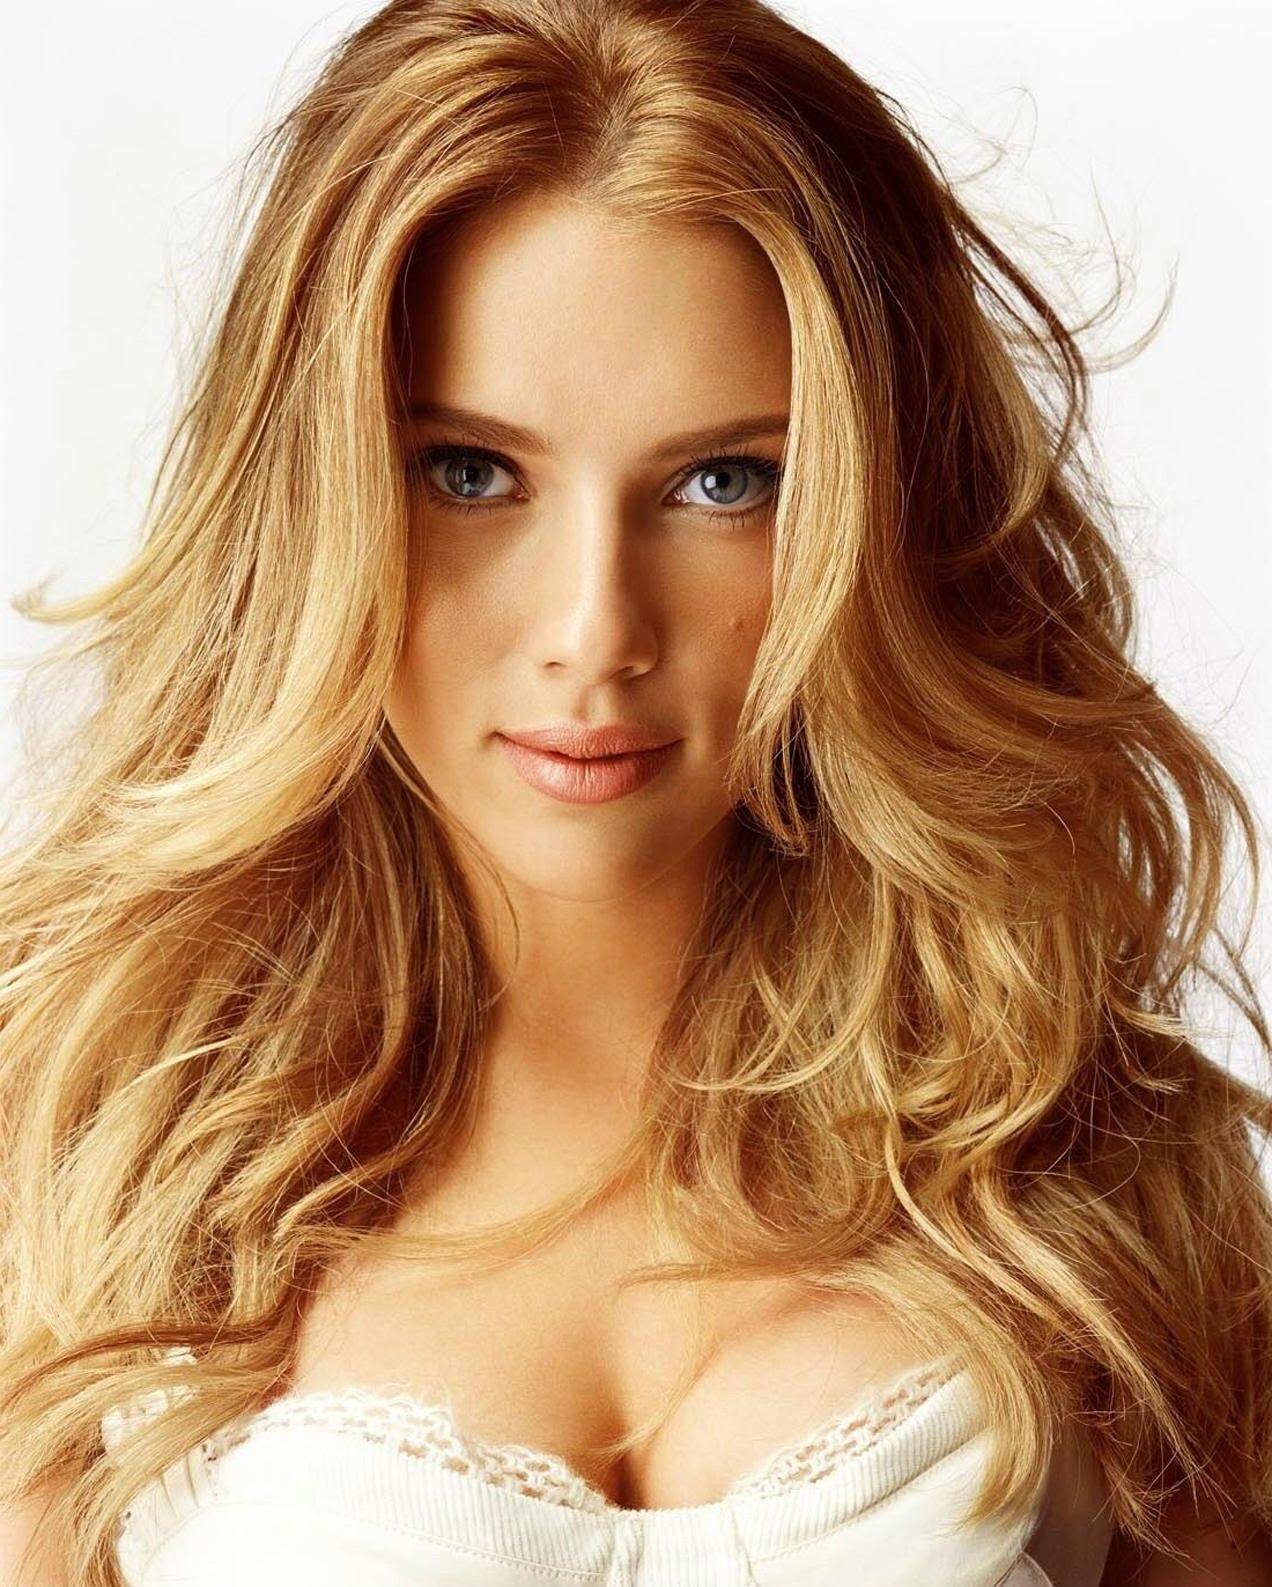 Scarlett Johansson 16 Jpg Scarlett Johansson Pictures